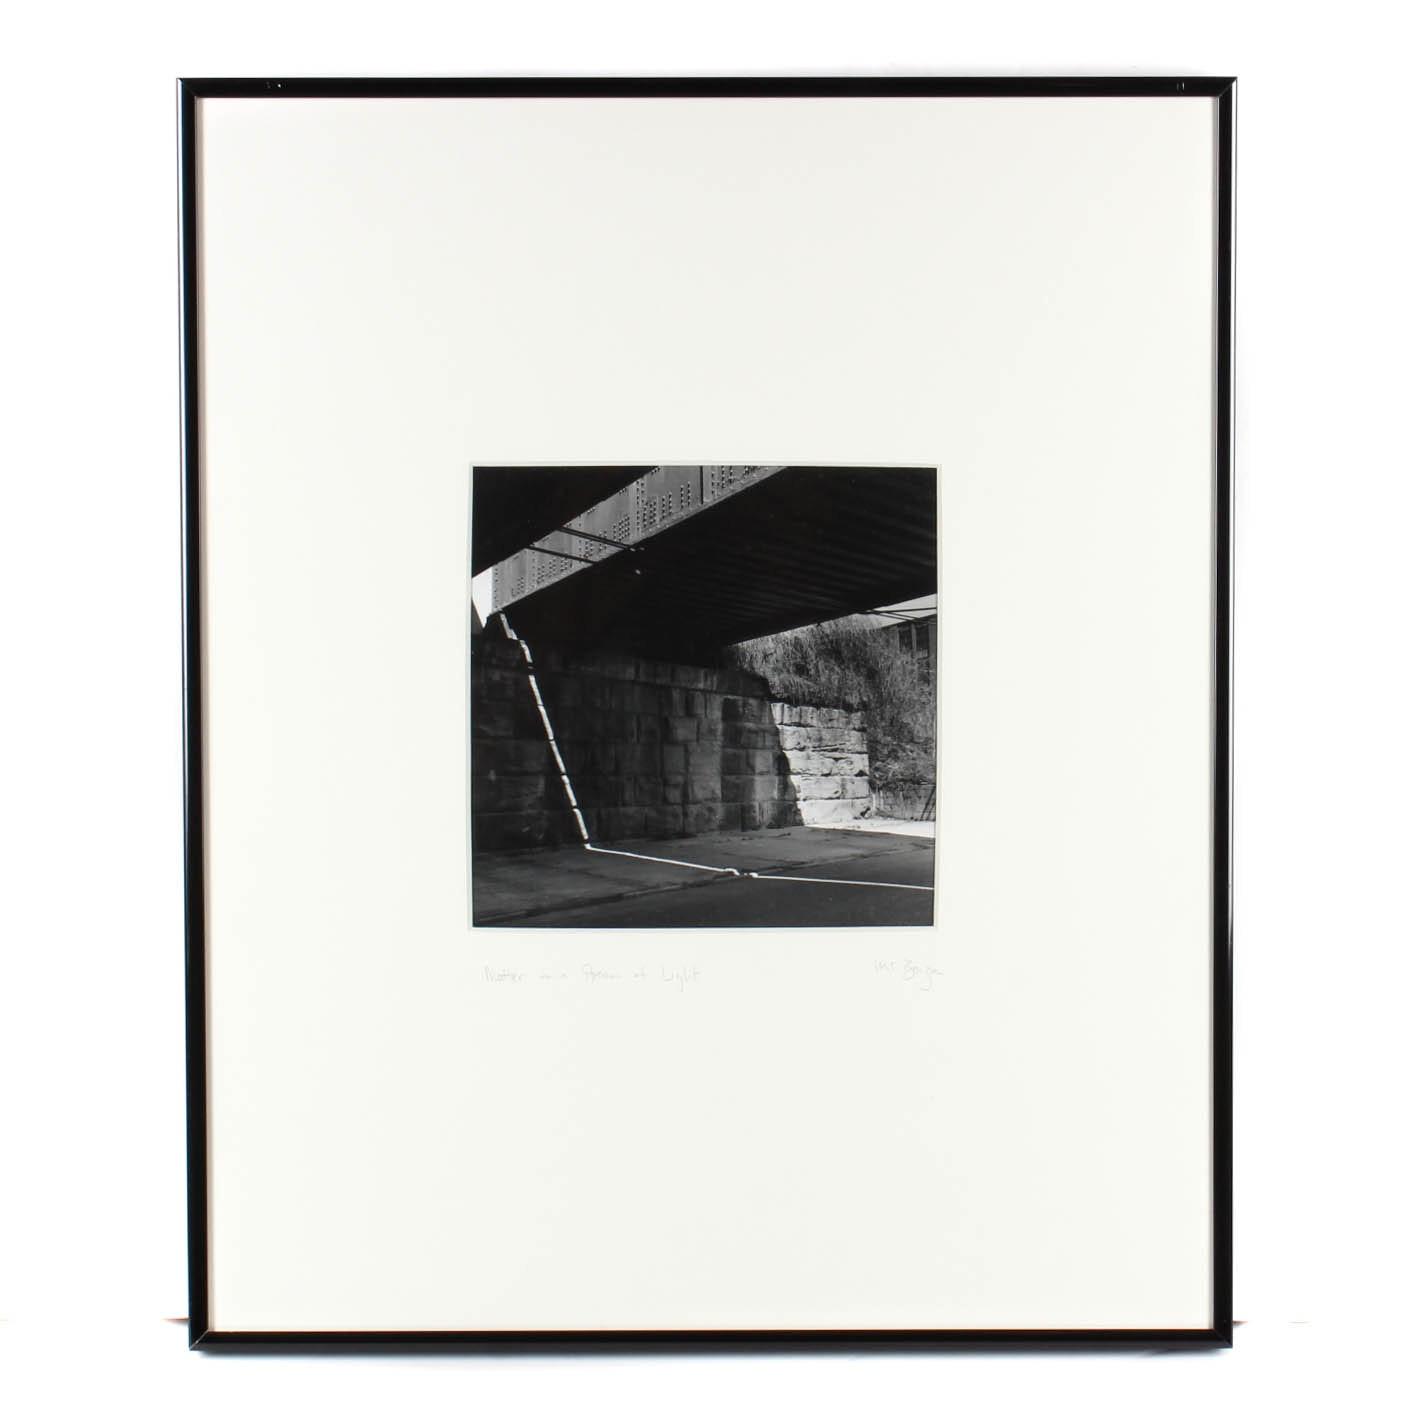 "Michael Bauza Photograph ""Matter in a Stream of Light"""